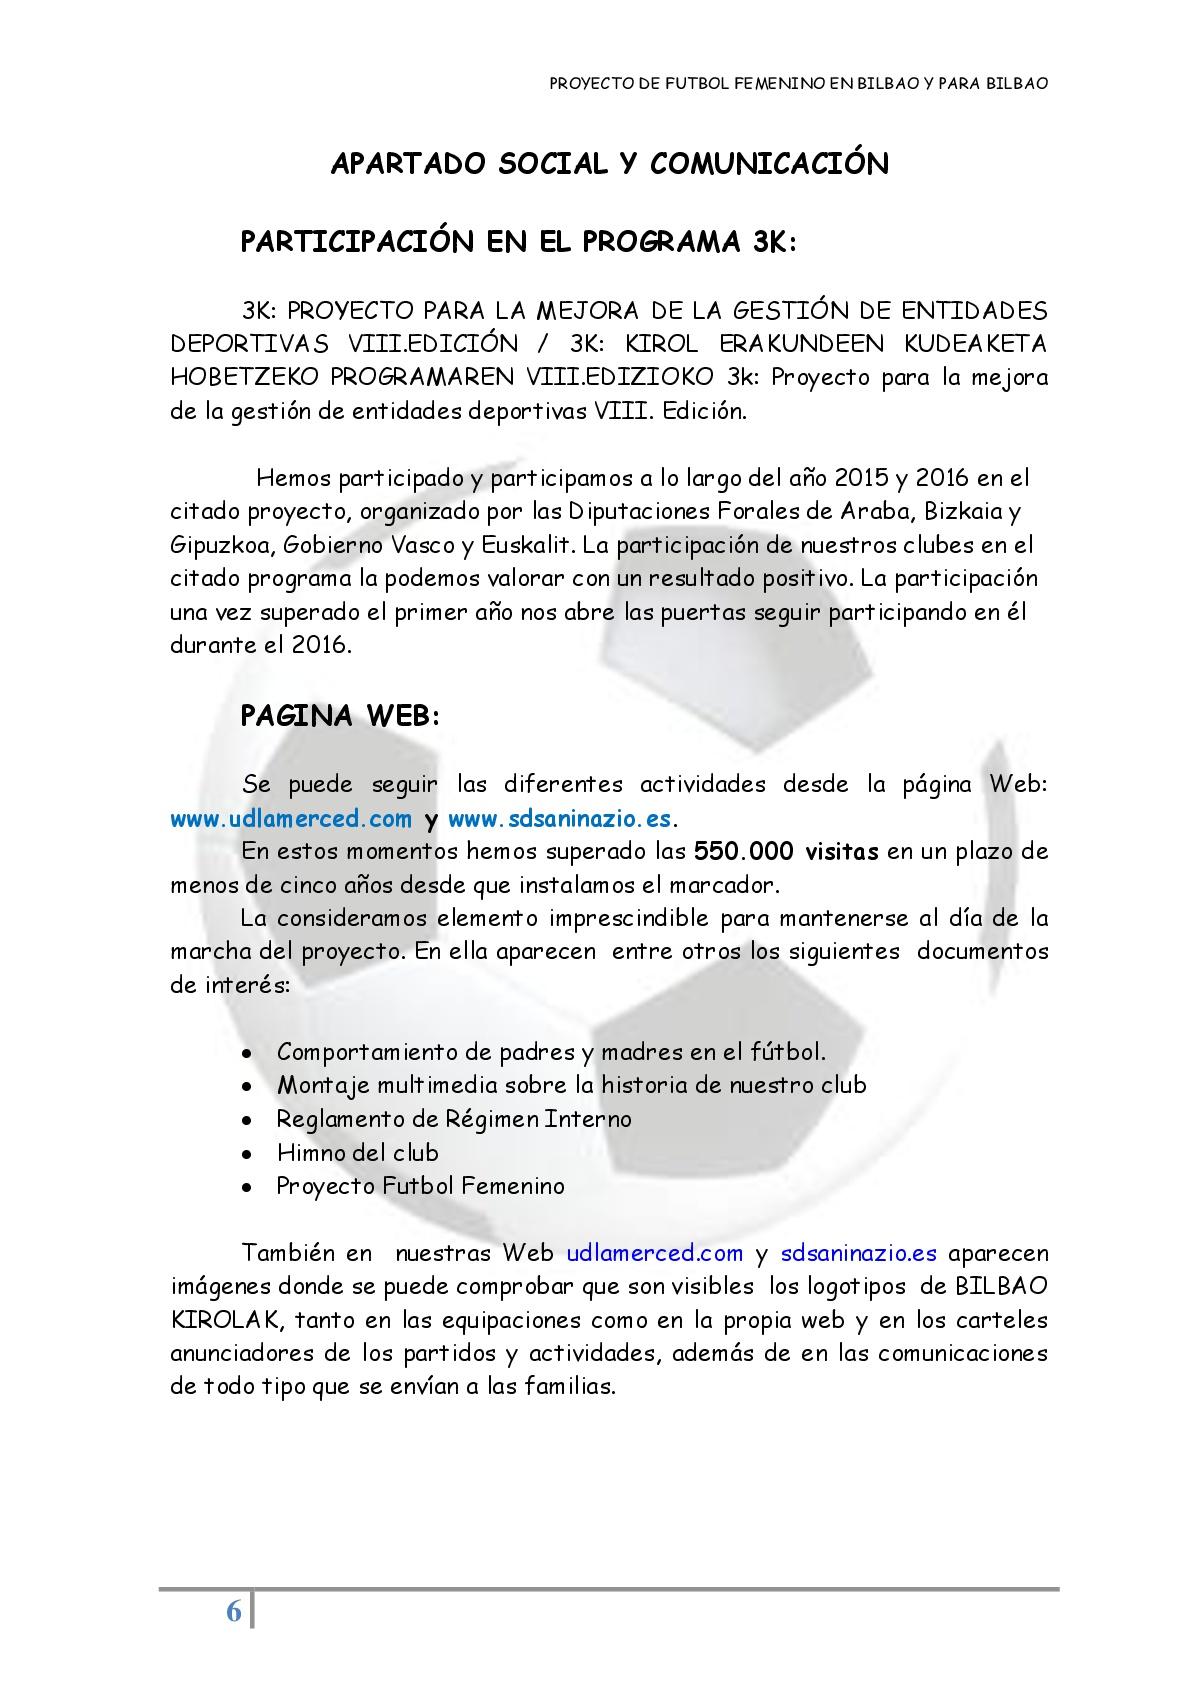 proyecto-futbol-femenino-05-ficha-006